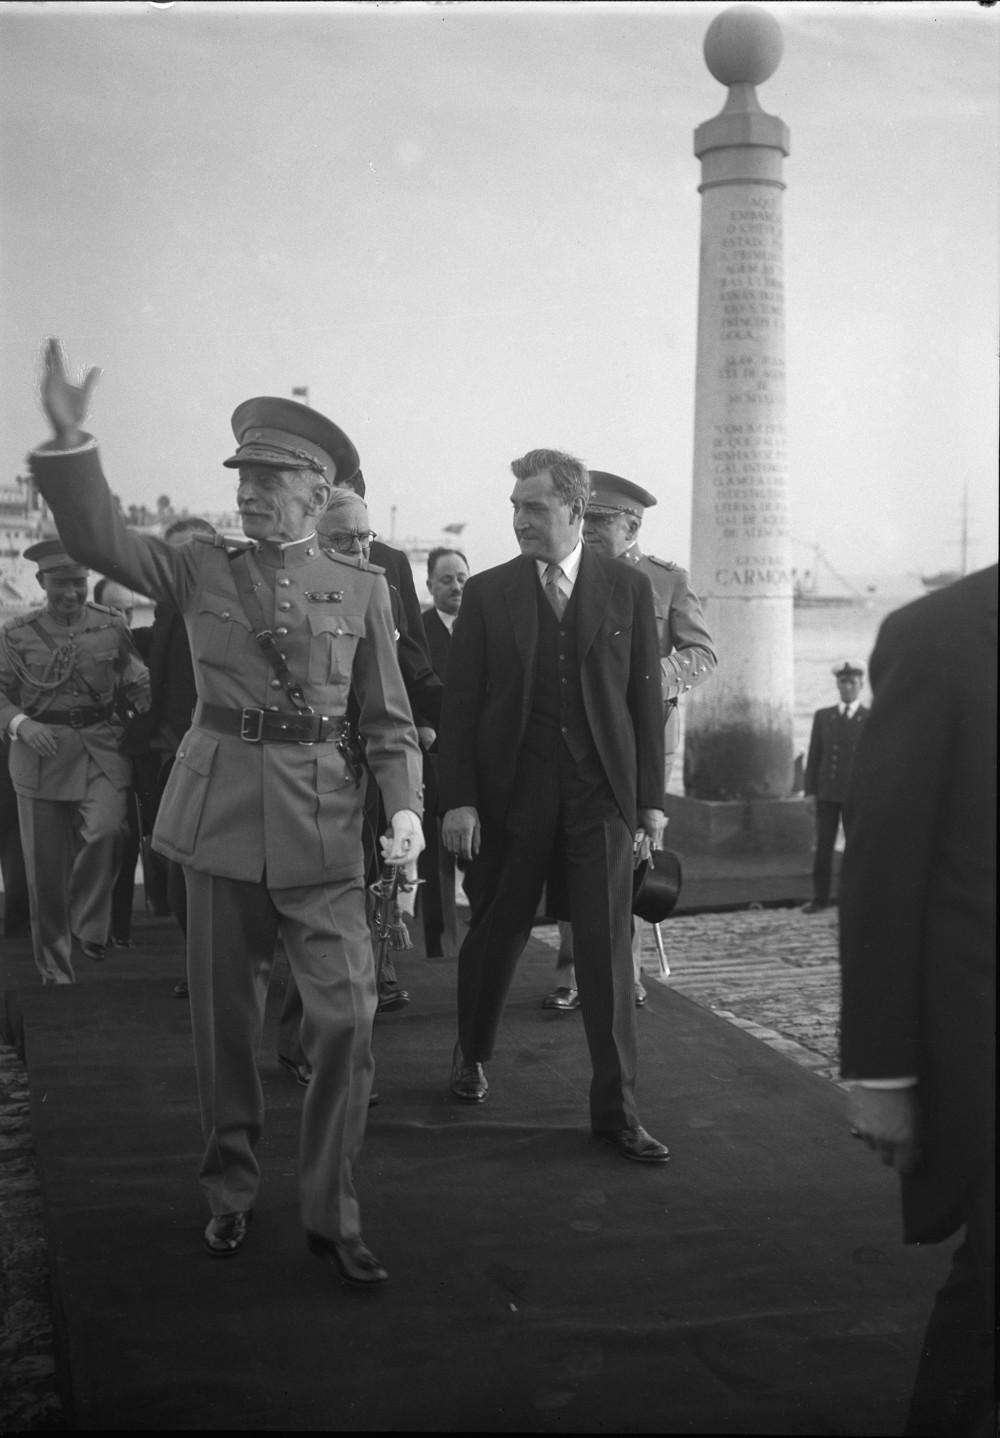 General Óscar Carmona, Portugal